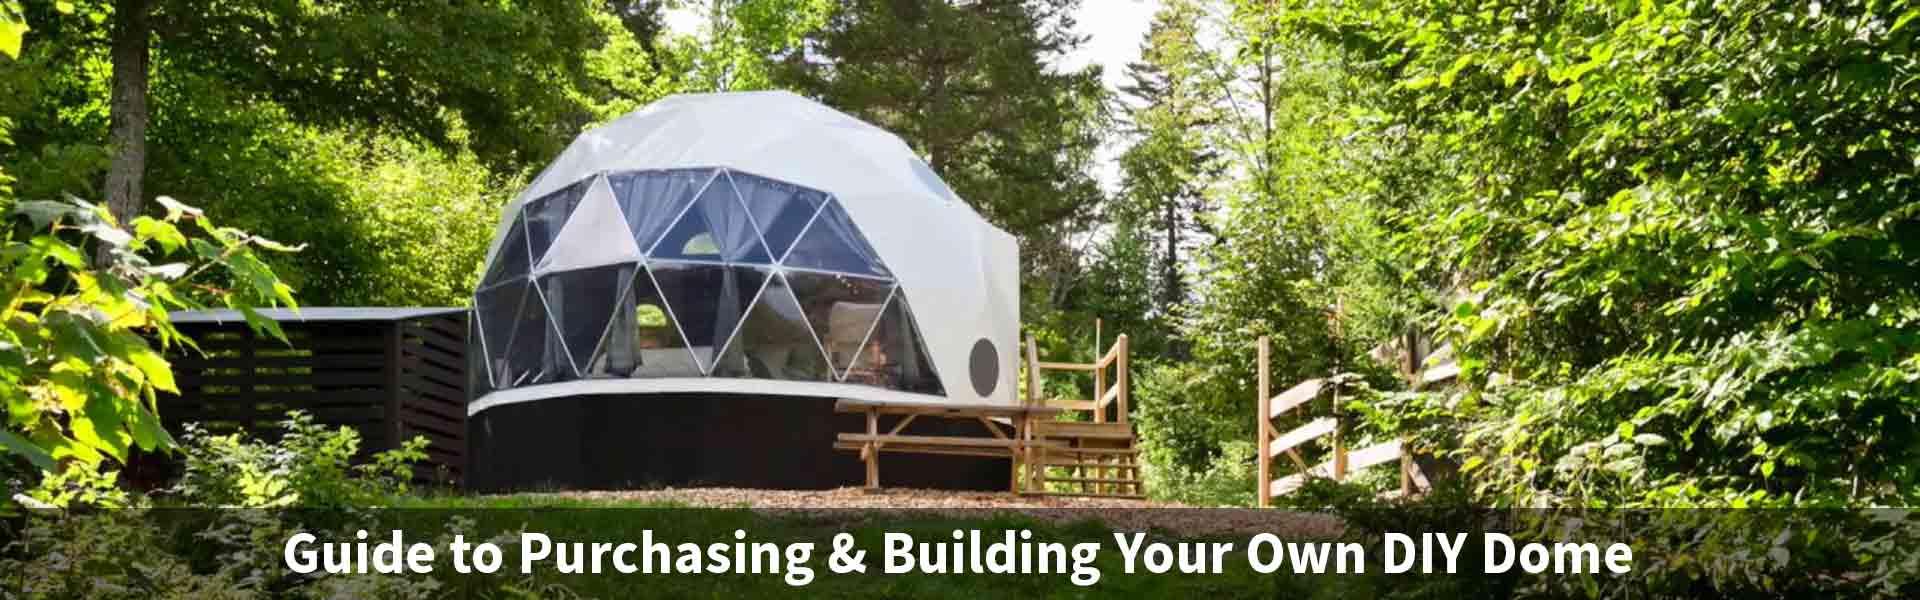 DIY Dome Guide